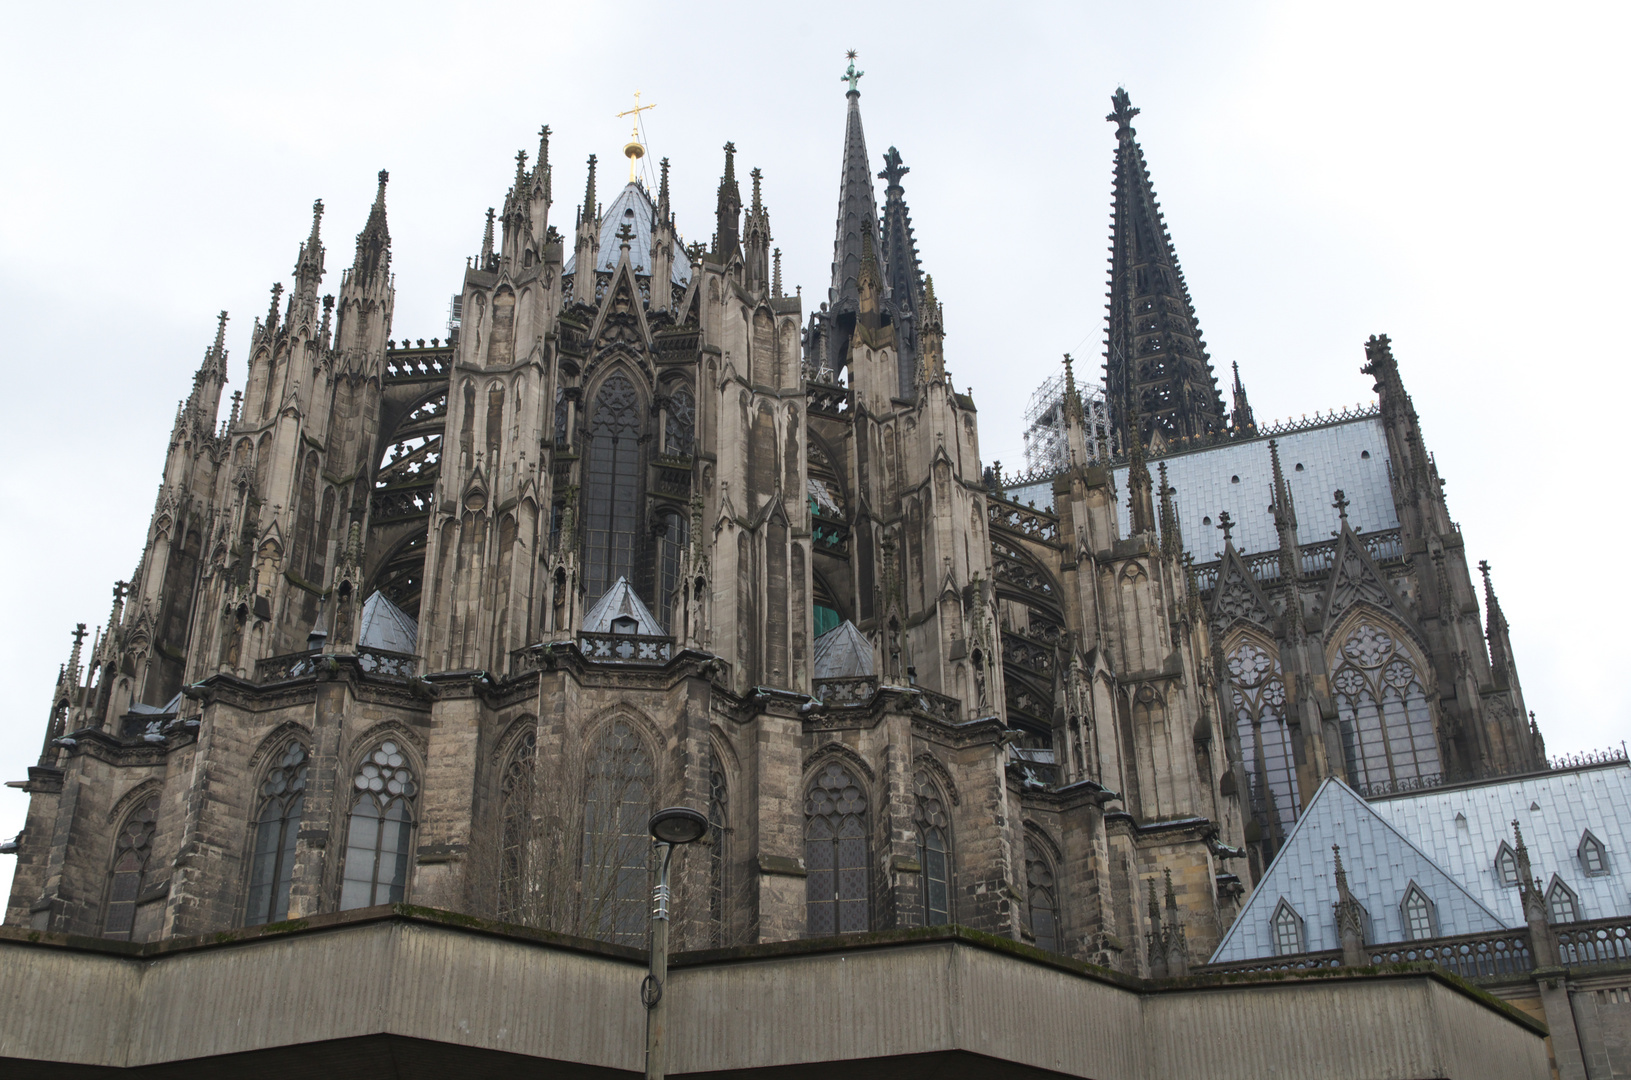 Cathedrale - Dom auf Betontablett